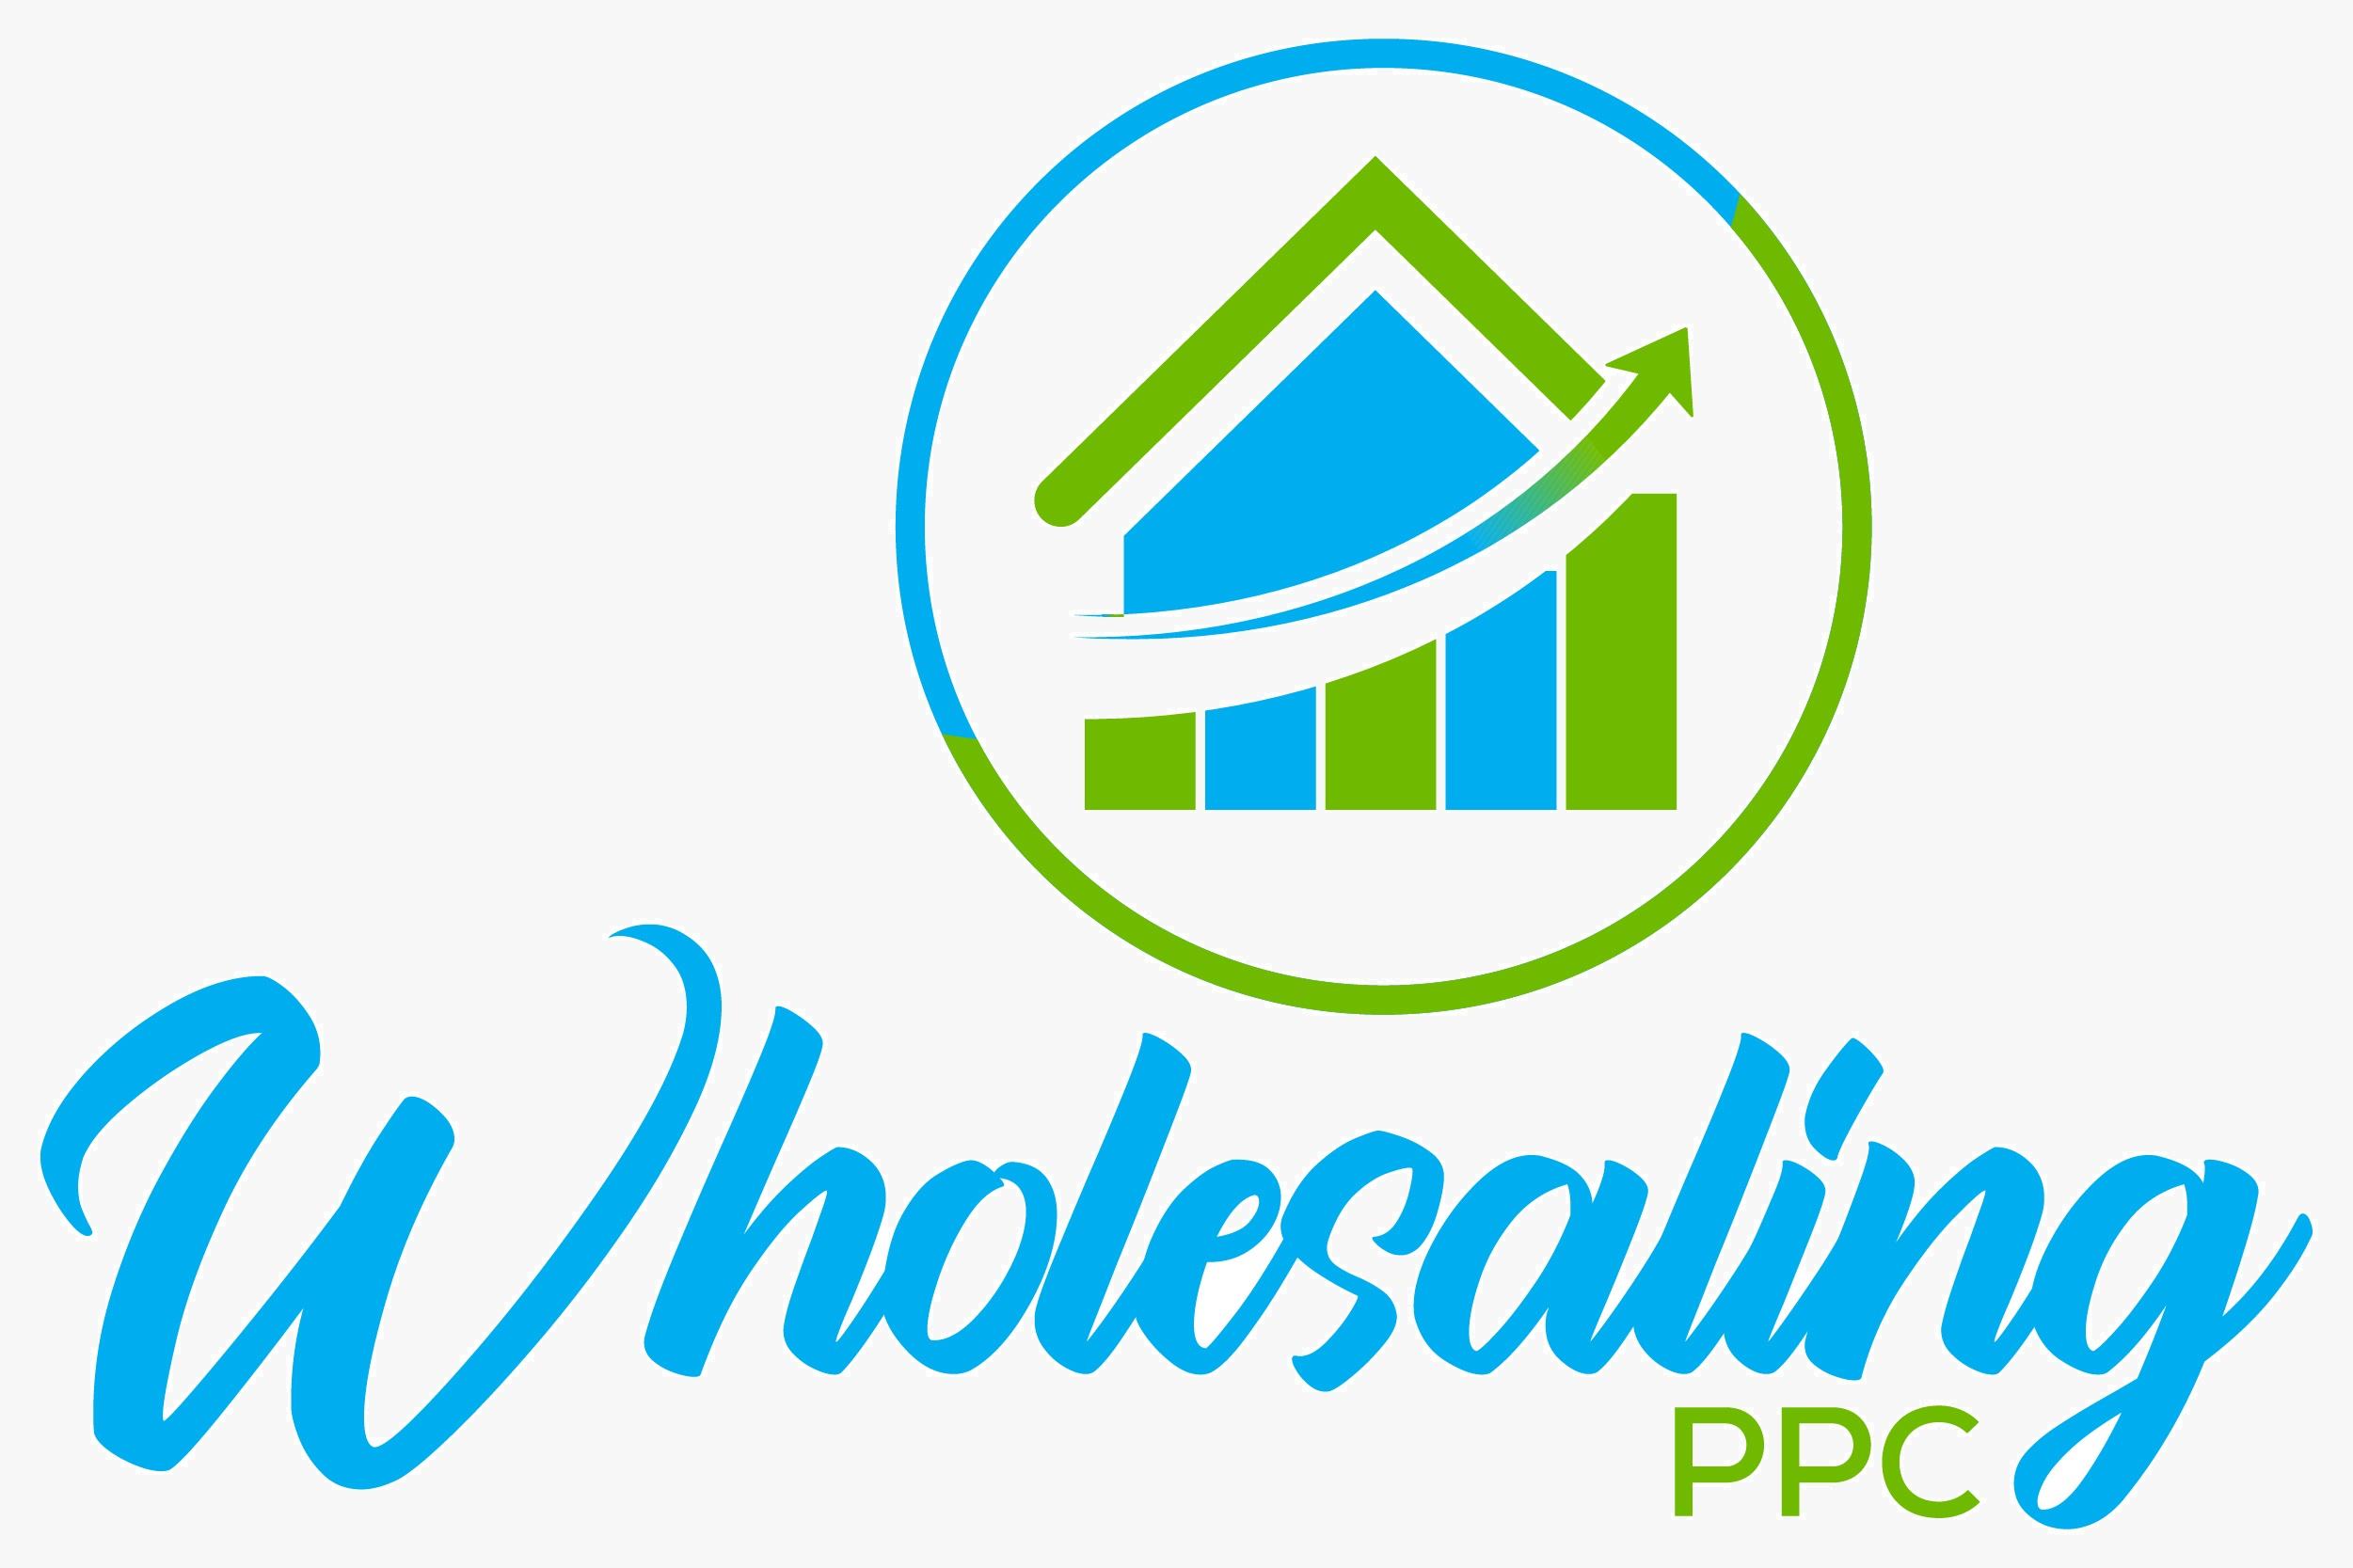 Wholesaling PPC